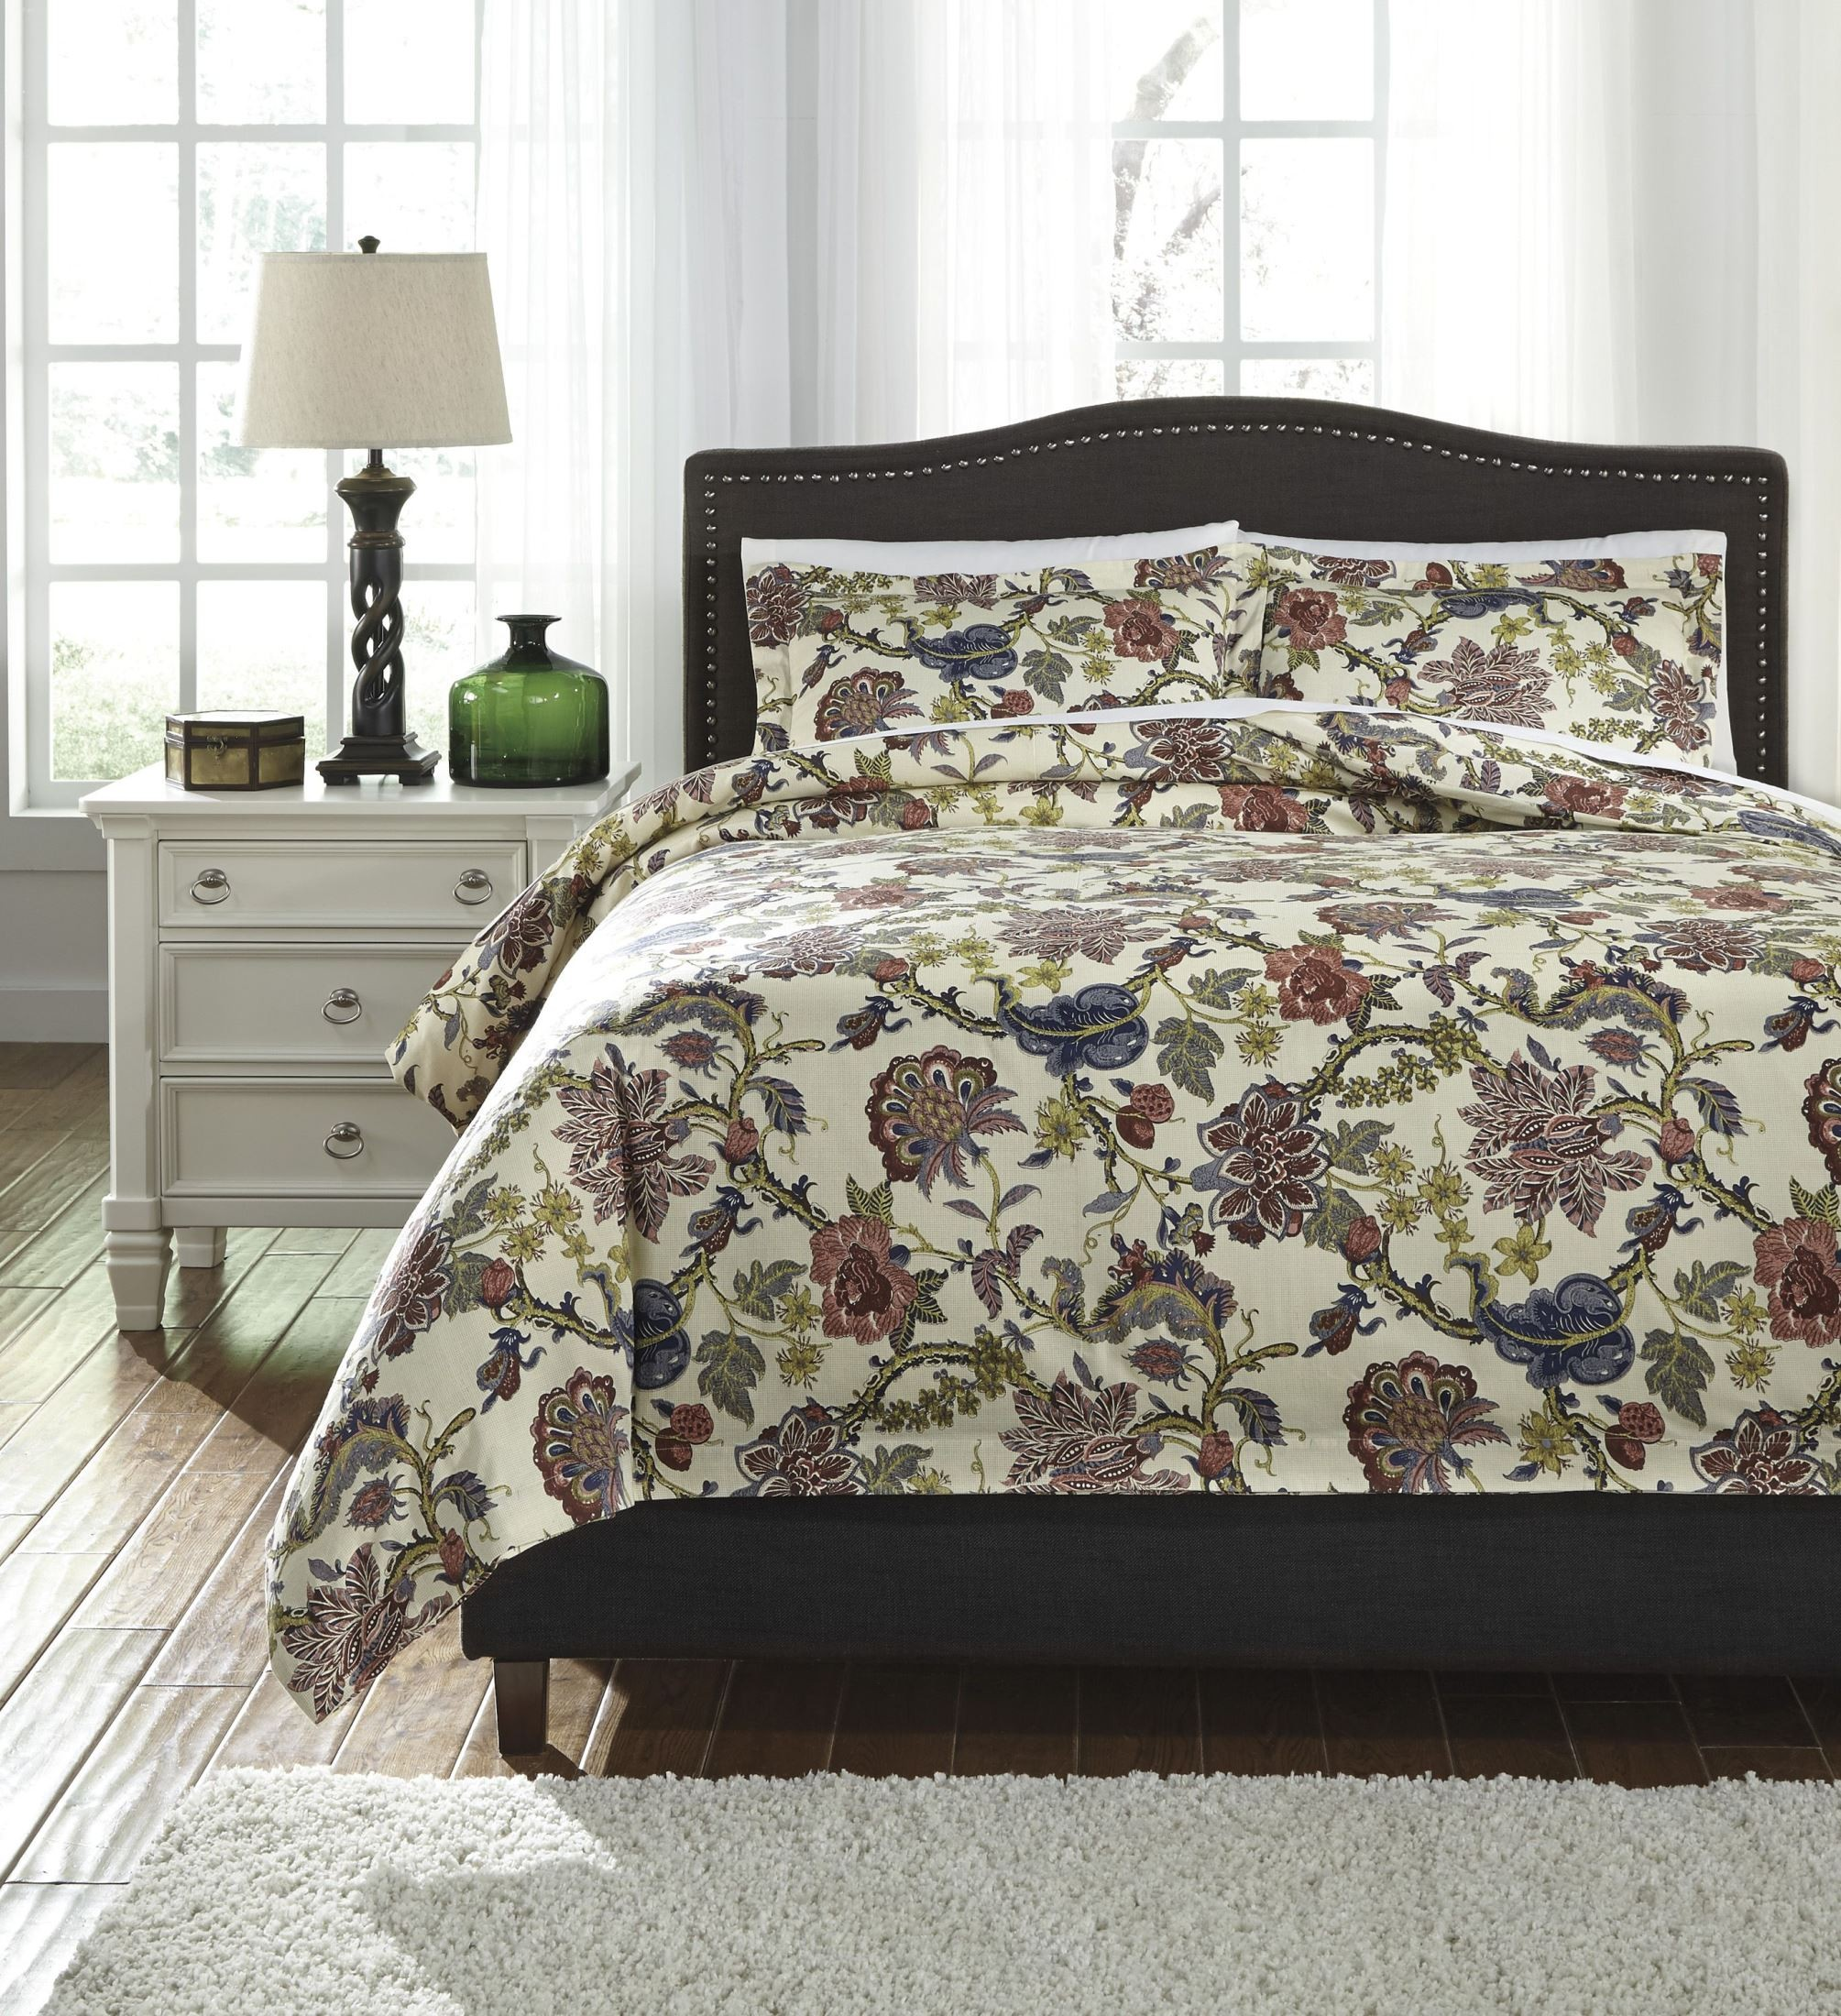 dameka floral queen duvet cover set q267003q ashley. Black Bedroom Furniture Sets. Home Design Ideas